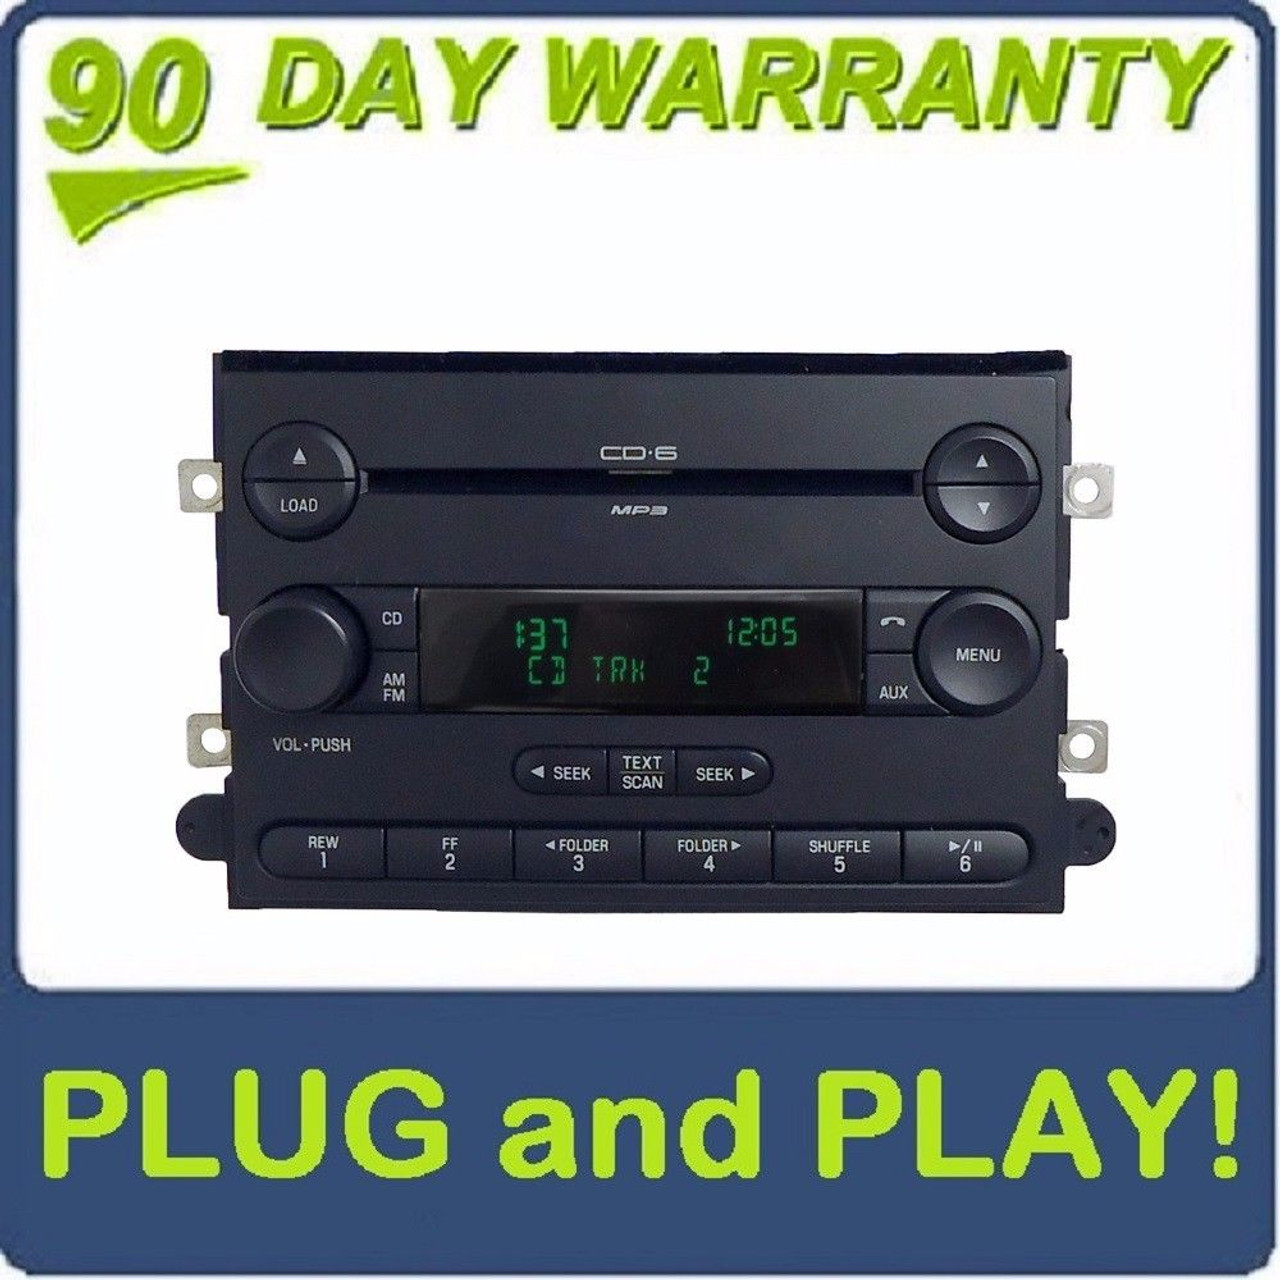 FORD LINCOLN F250 F350 MERCURY AM FM Radio 6 Disc Changer MP3 CD Player OEM